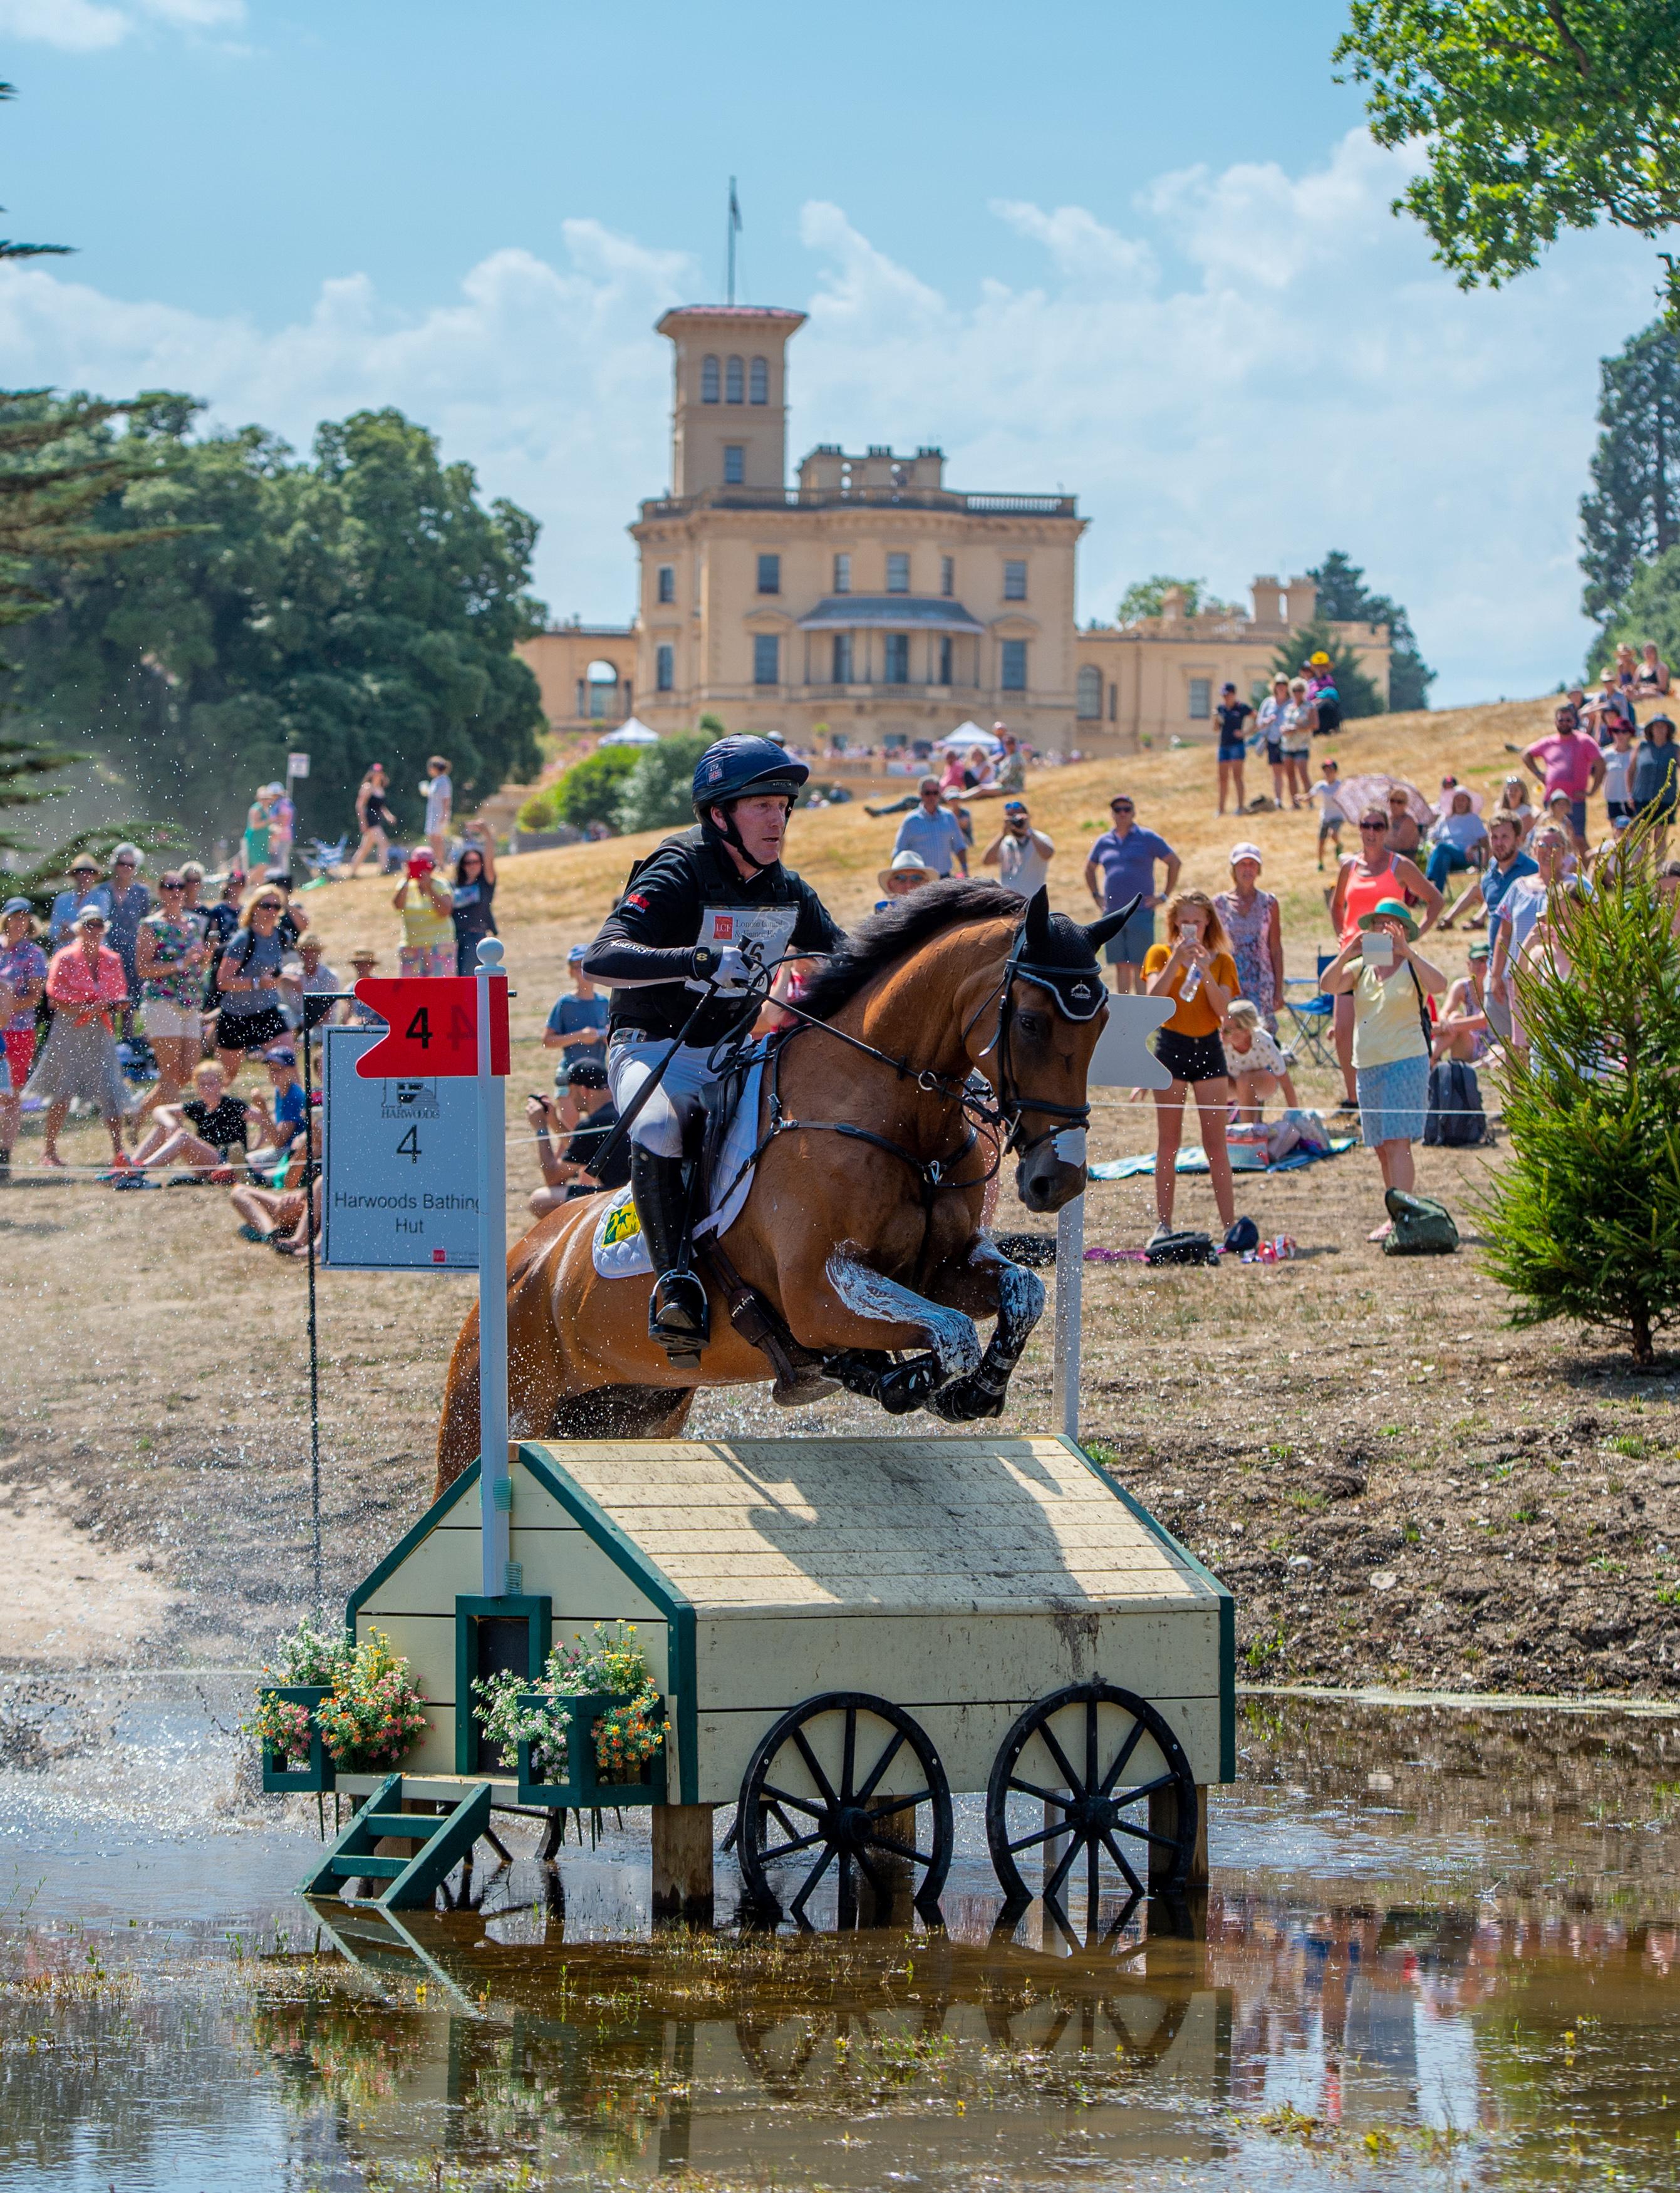 Horse Trials voltará à Ilha de Wight |  Eventing 3